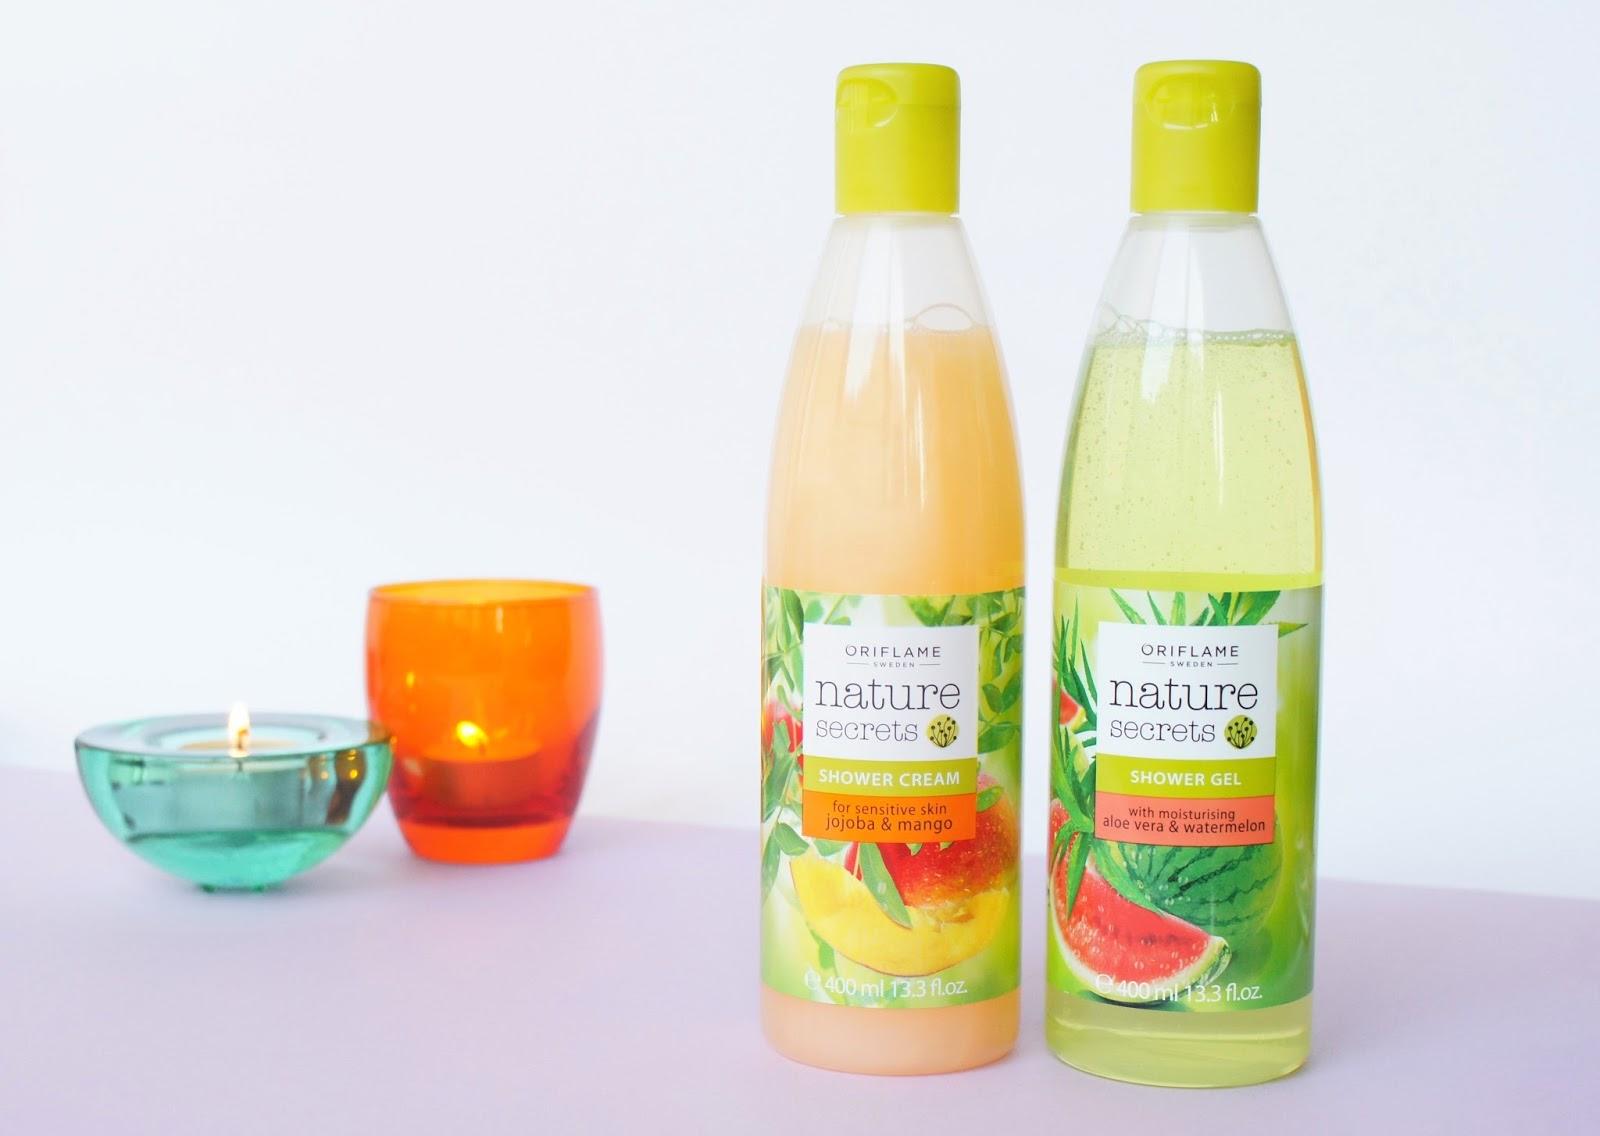 best shampoo philosophy bubble smelling shower sg gel bath cake vanilla birthday